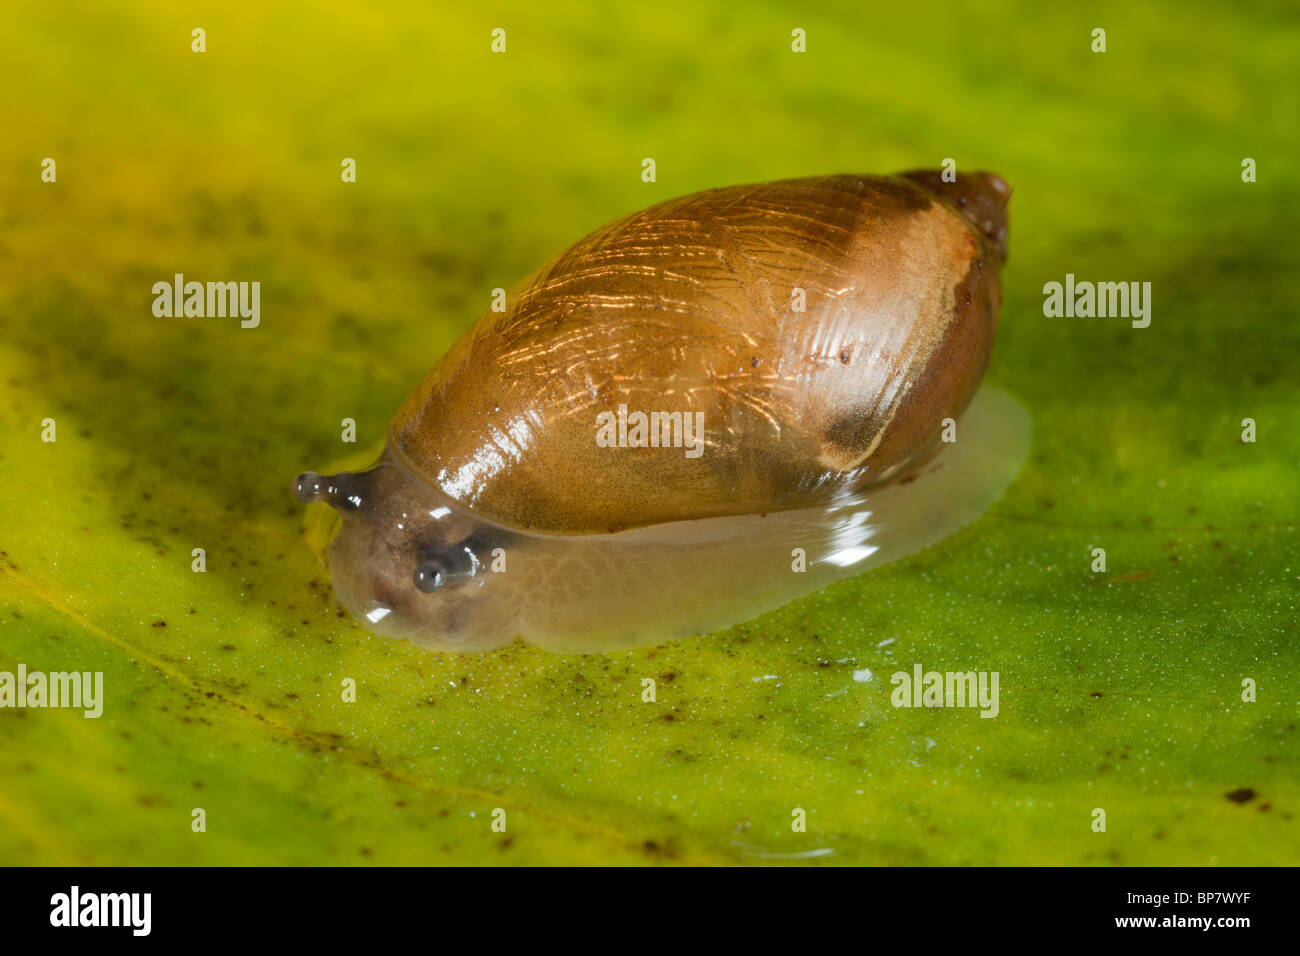 A small amphibious snail, Succinea pfeifferi, Arthog Bog, North Wales Stock Photo